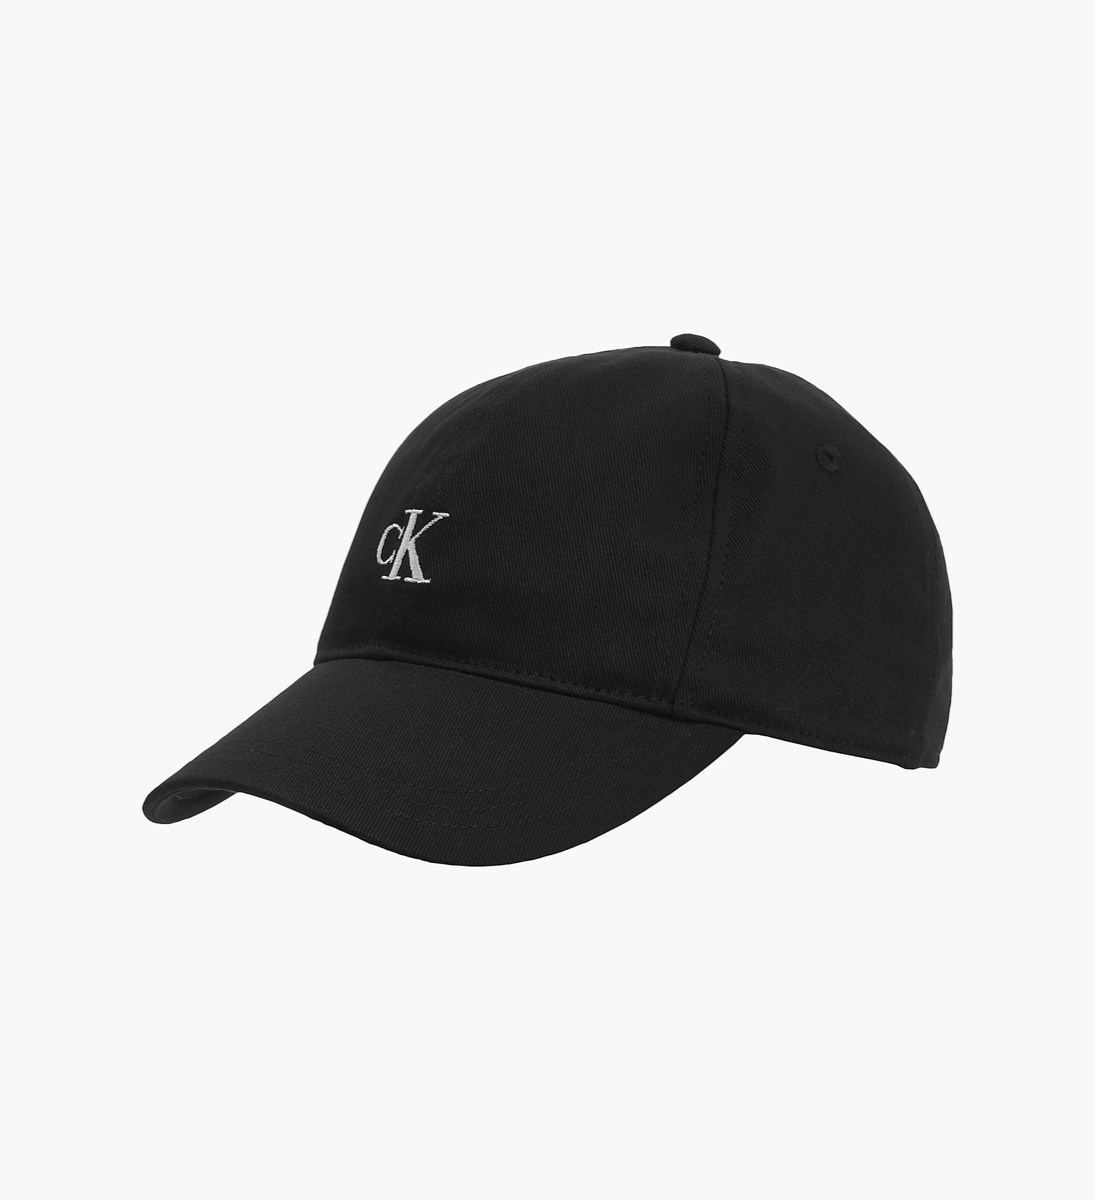 CK כובע שחור לוגו לבן